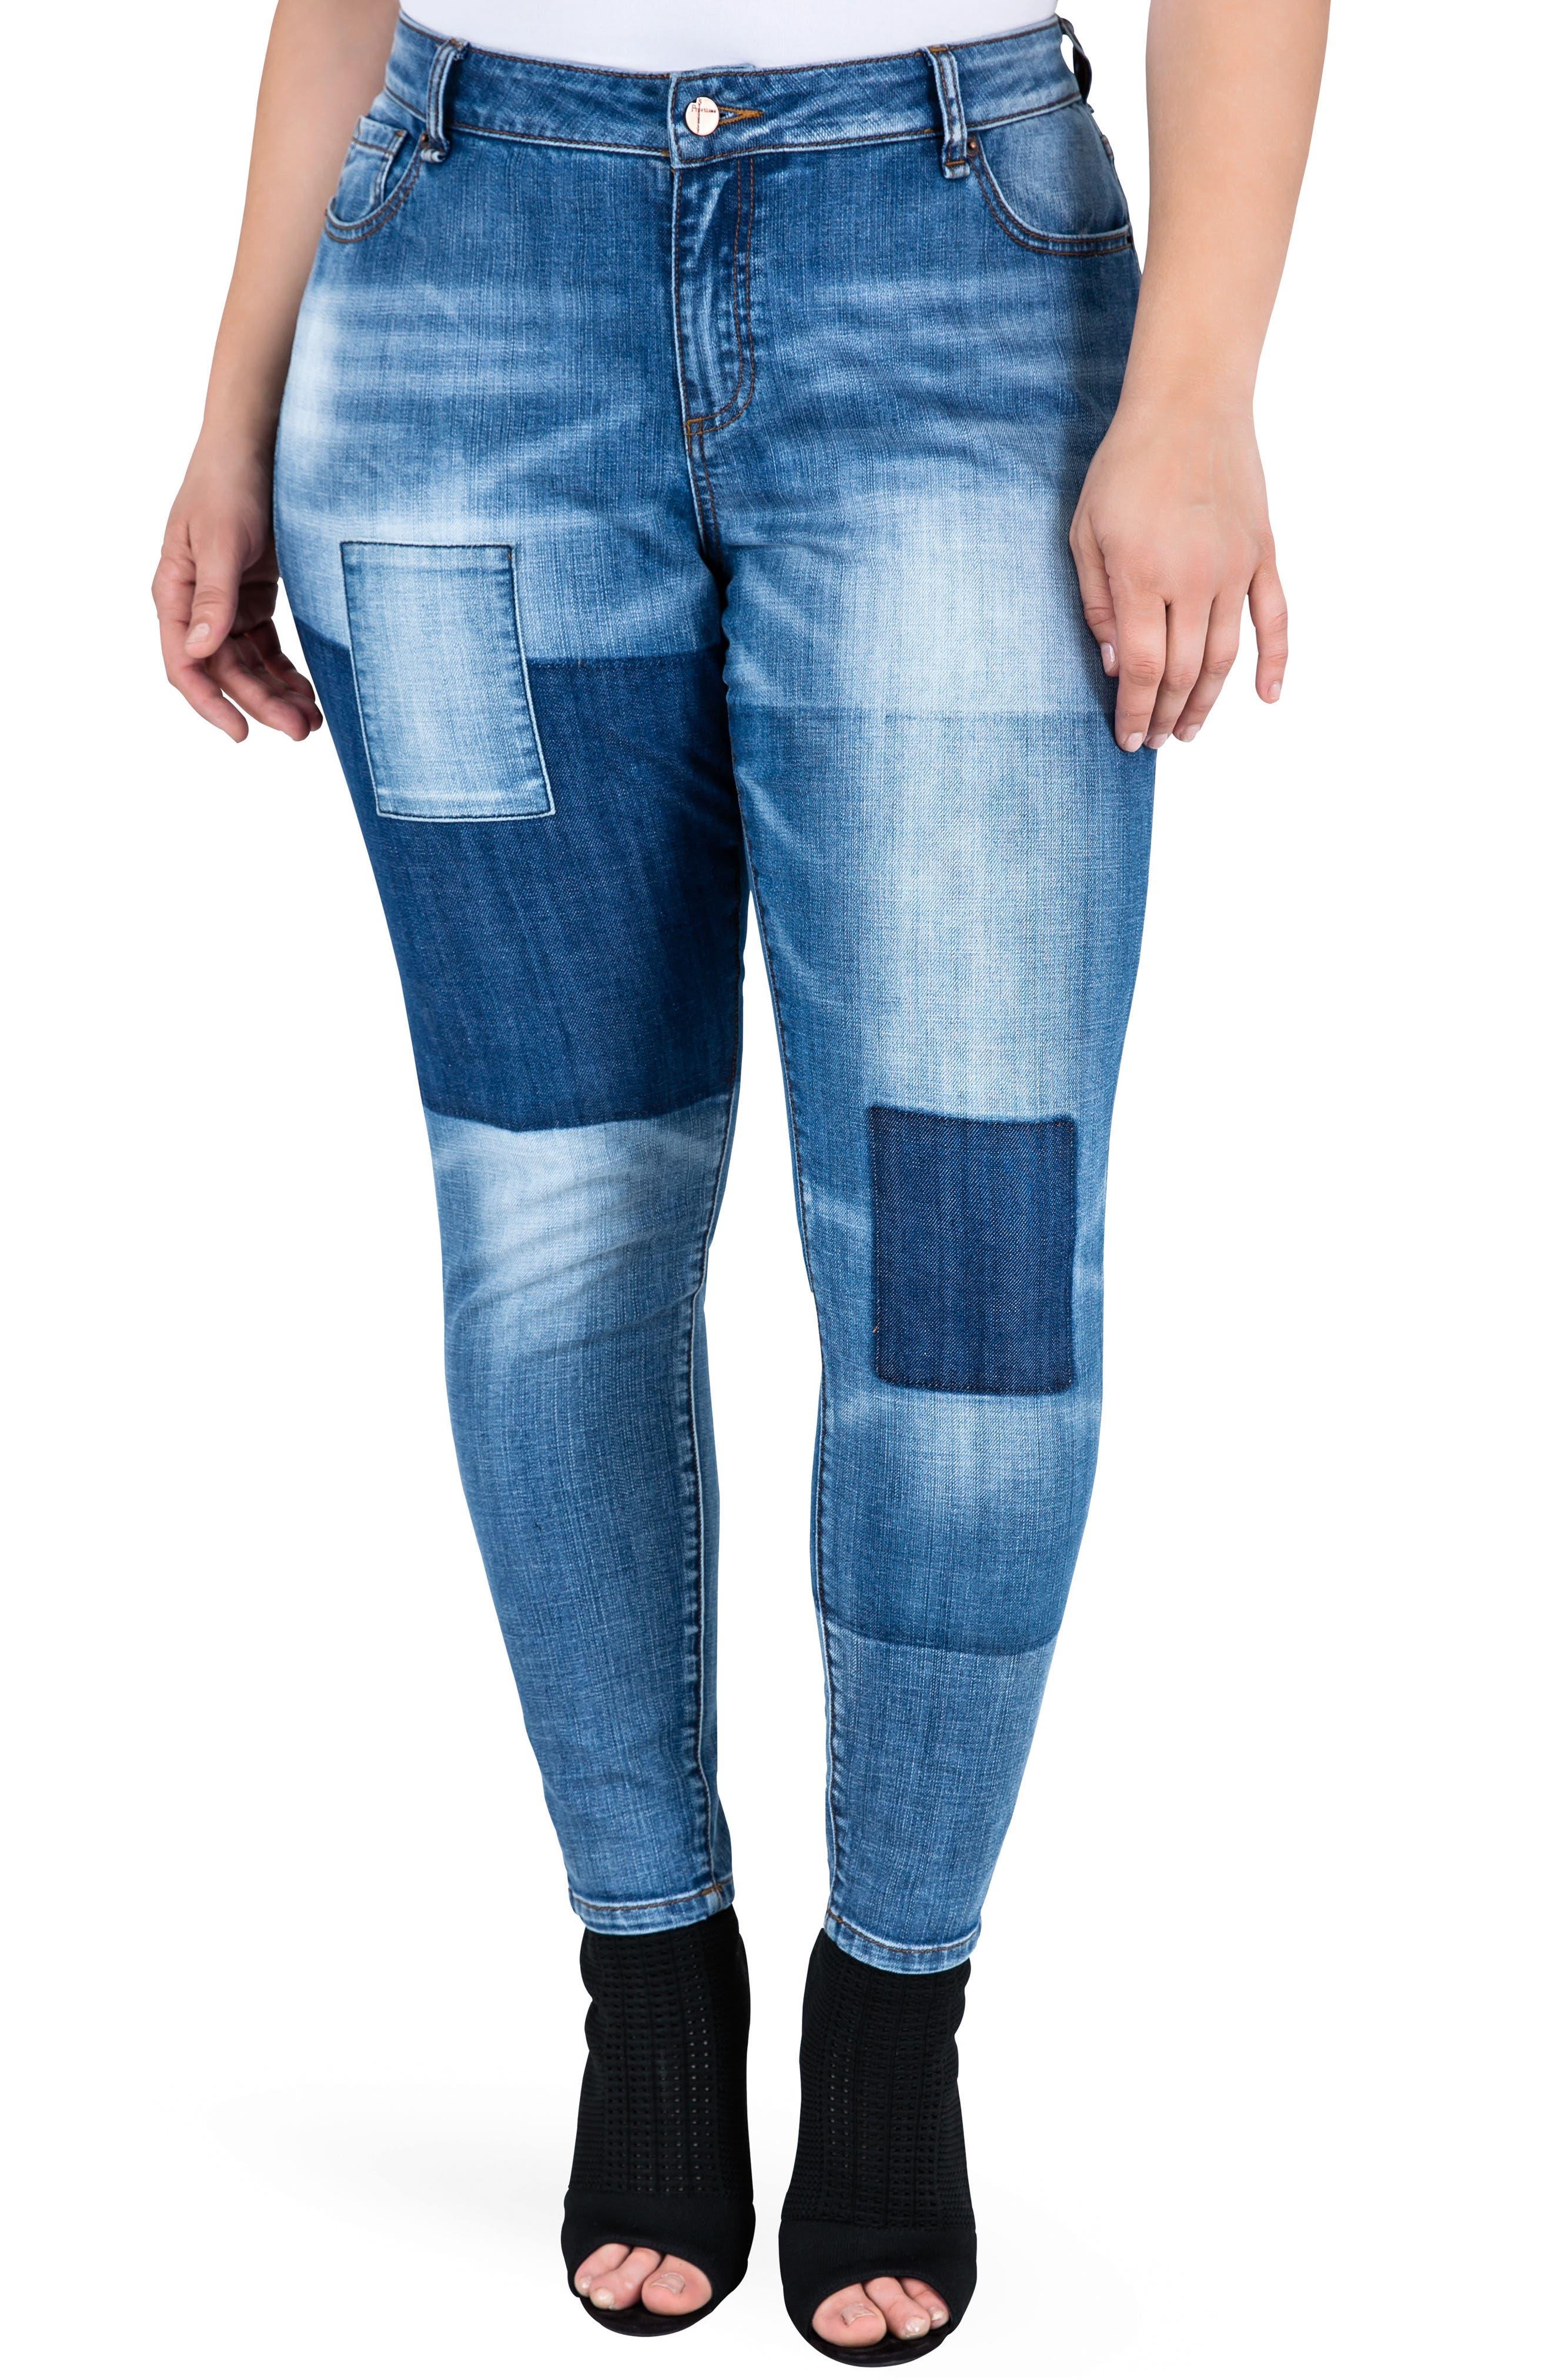 Plus Women's Standards & Practices Isabel Colorblock Skinny Jeans